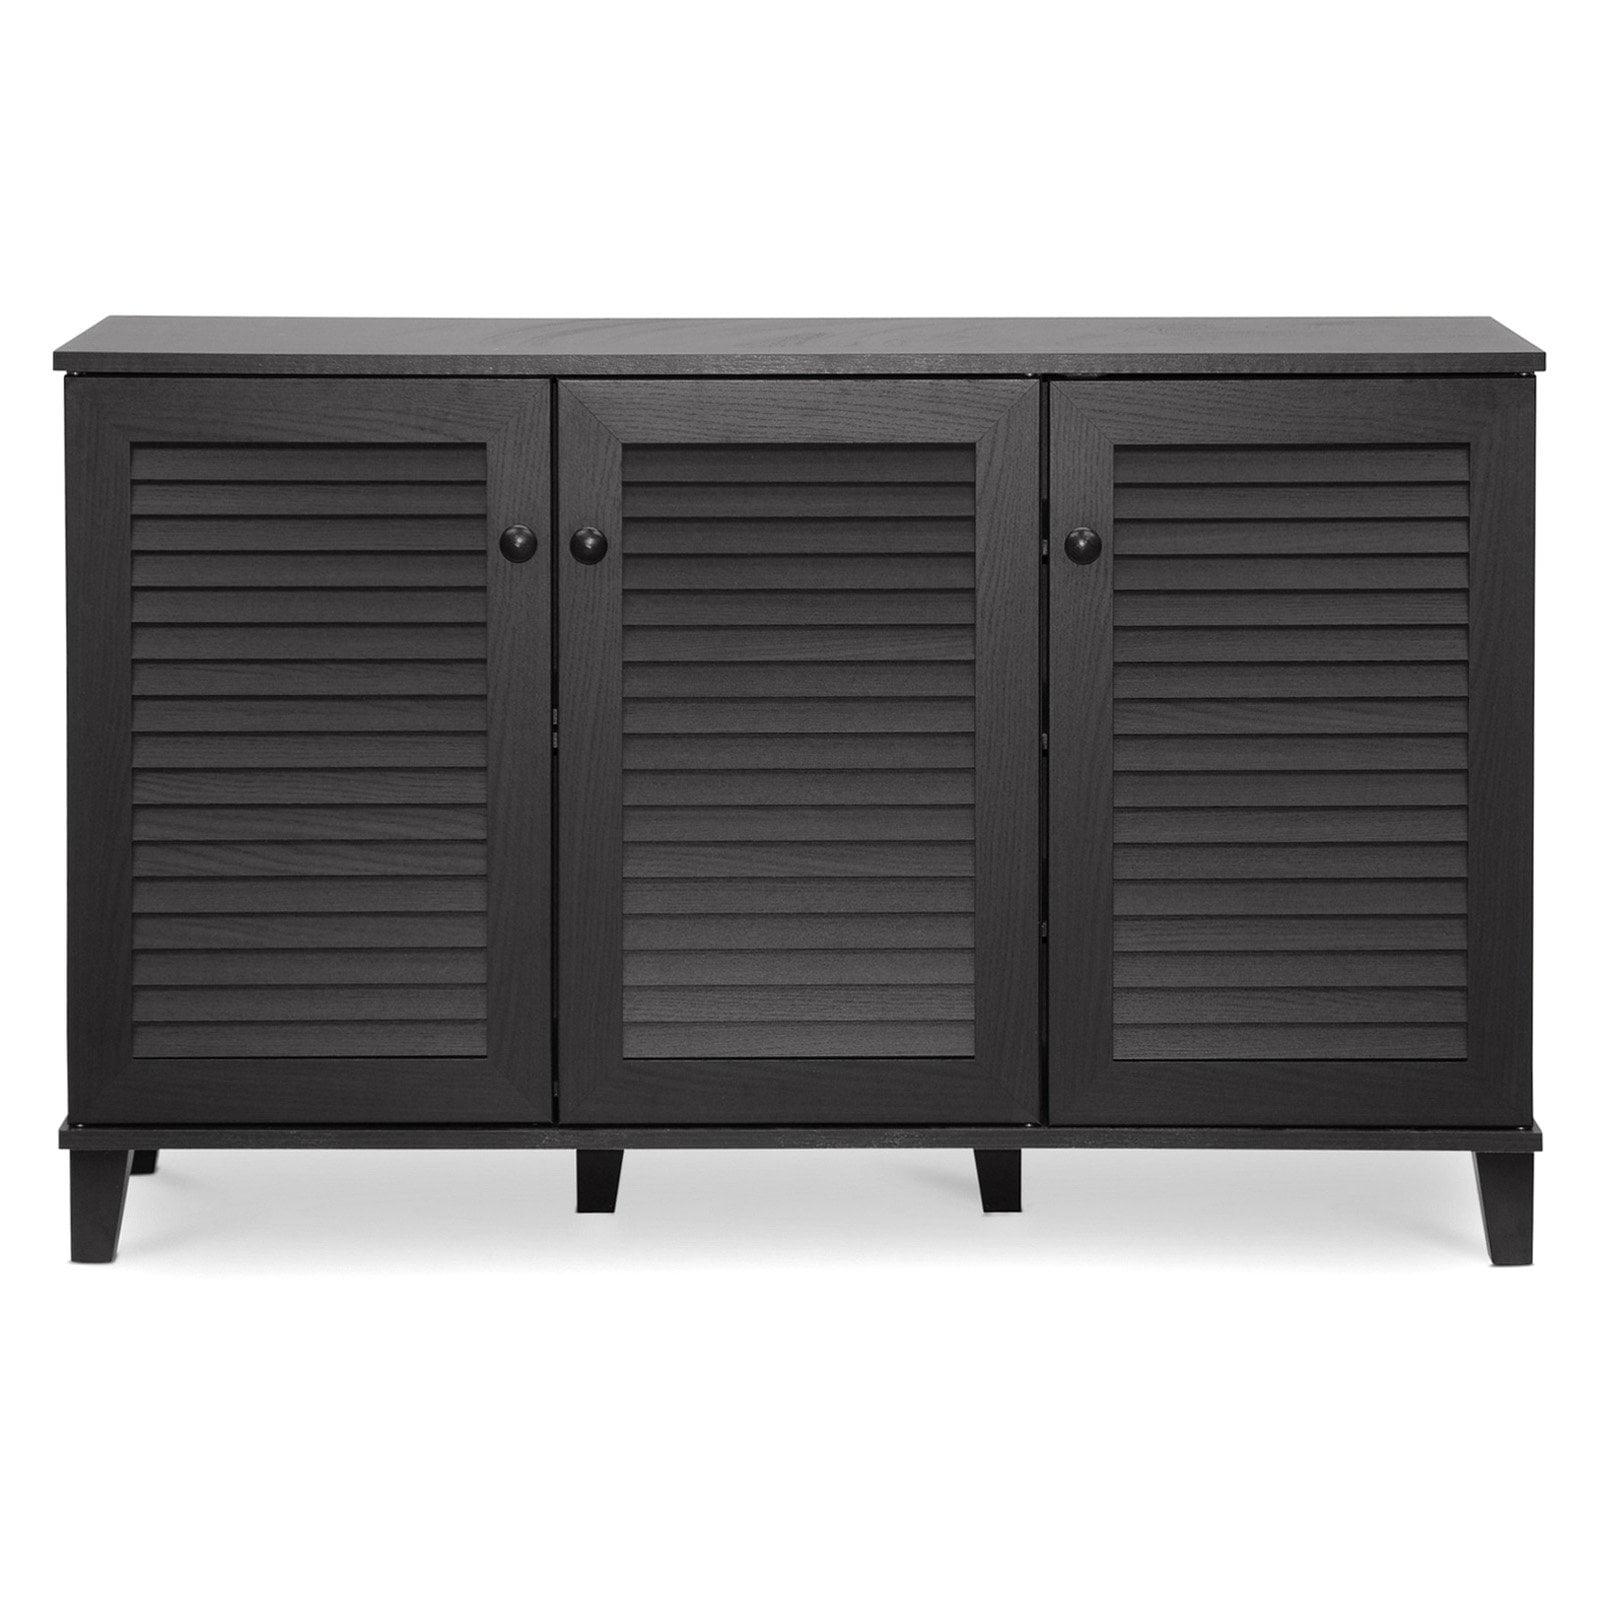 Baxton Studio Wood Cabinet